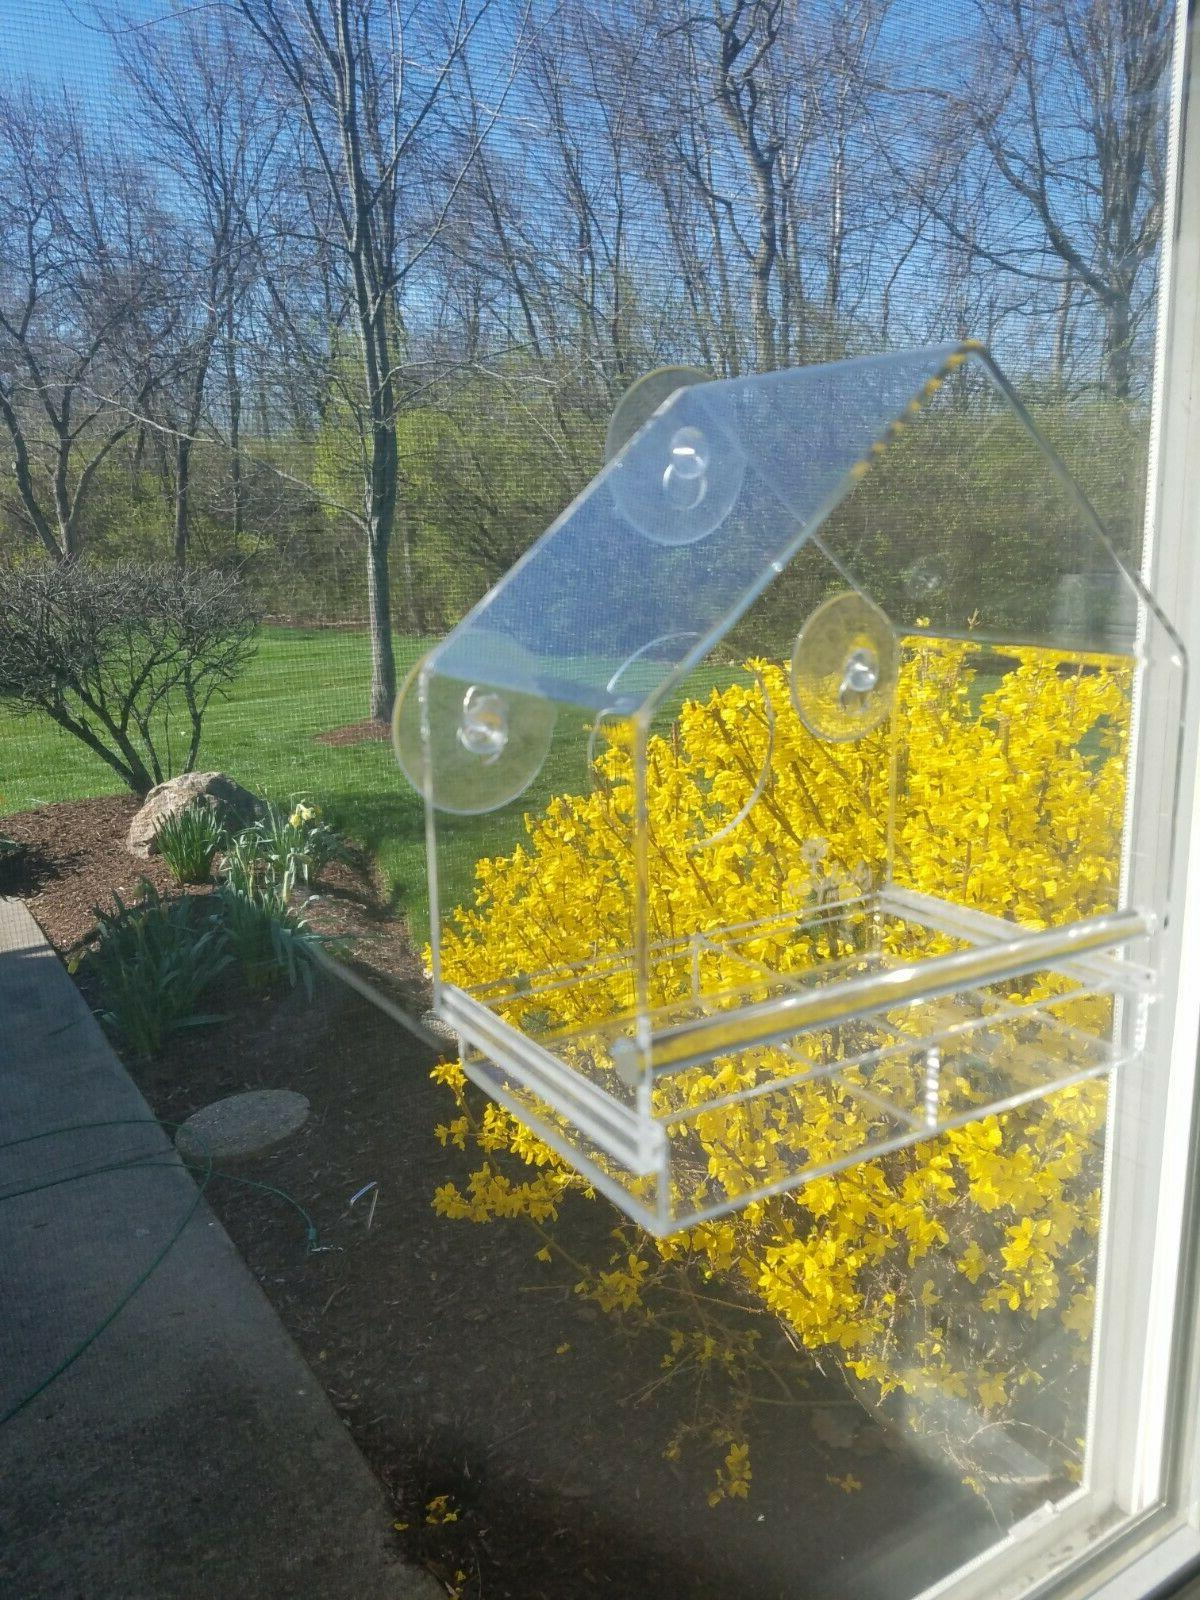 Acrylic Window with Removable Window Viewing Birdfeeder